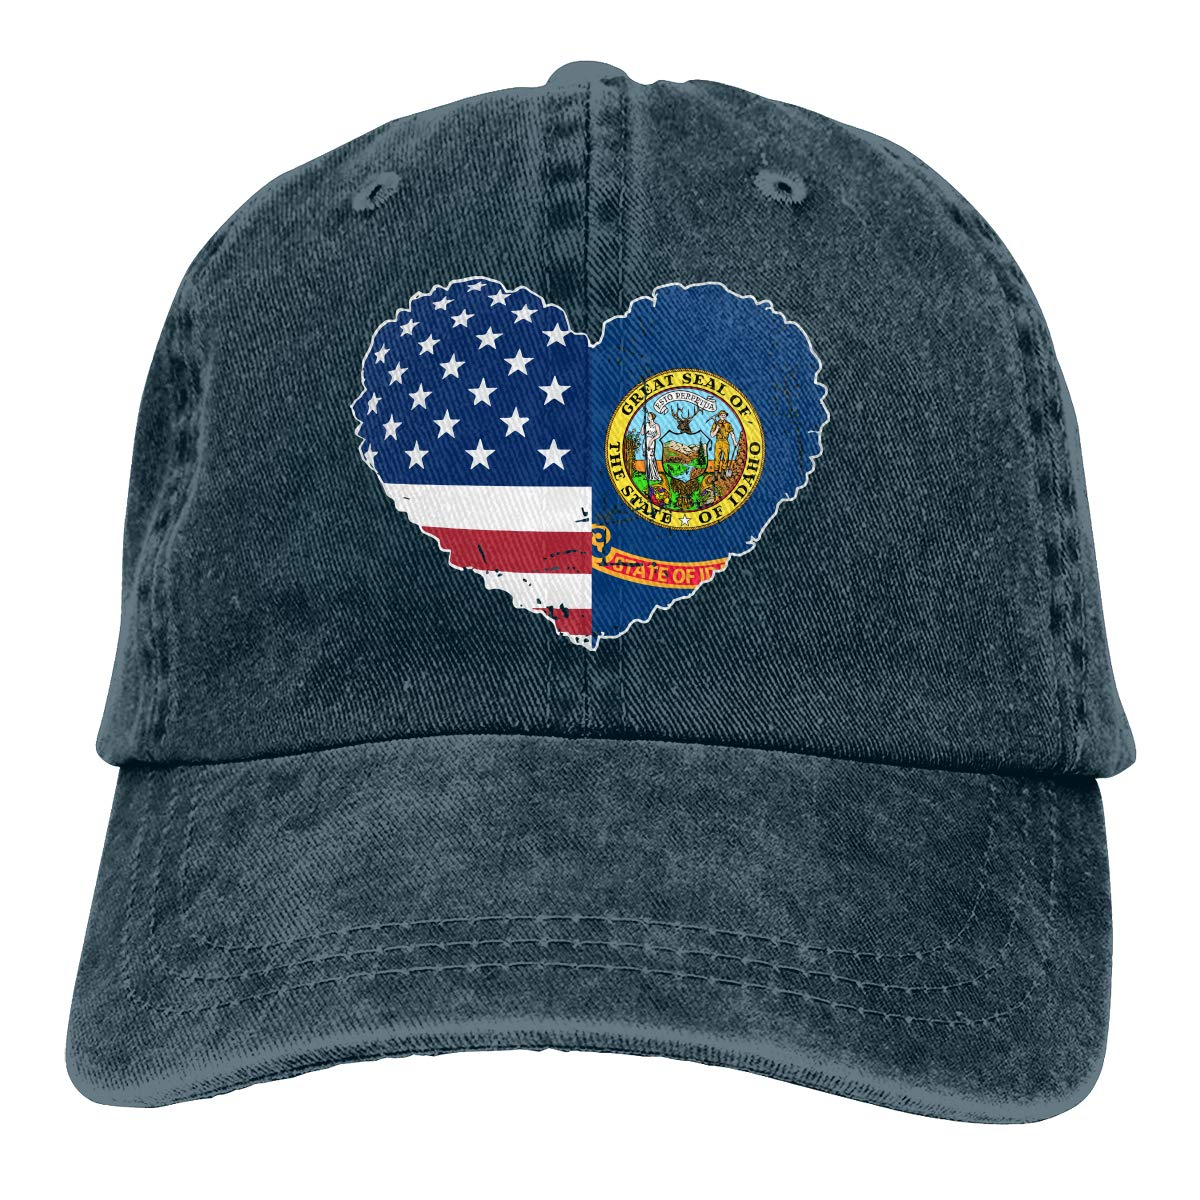 PMGM-C Idaho State USA Flag Heart Unisex Personalize Denim Outdoor Sports Hat Adjustable Baseball Cap